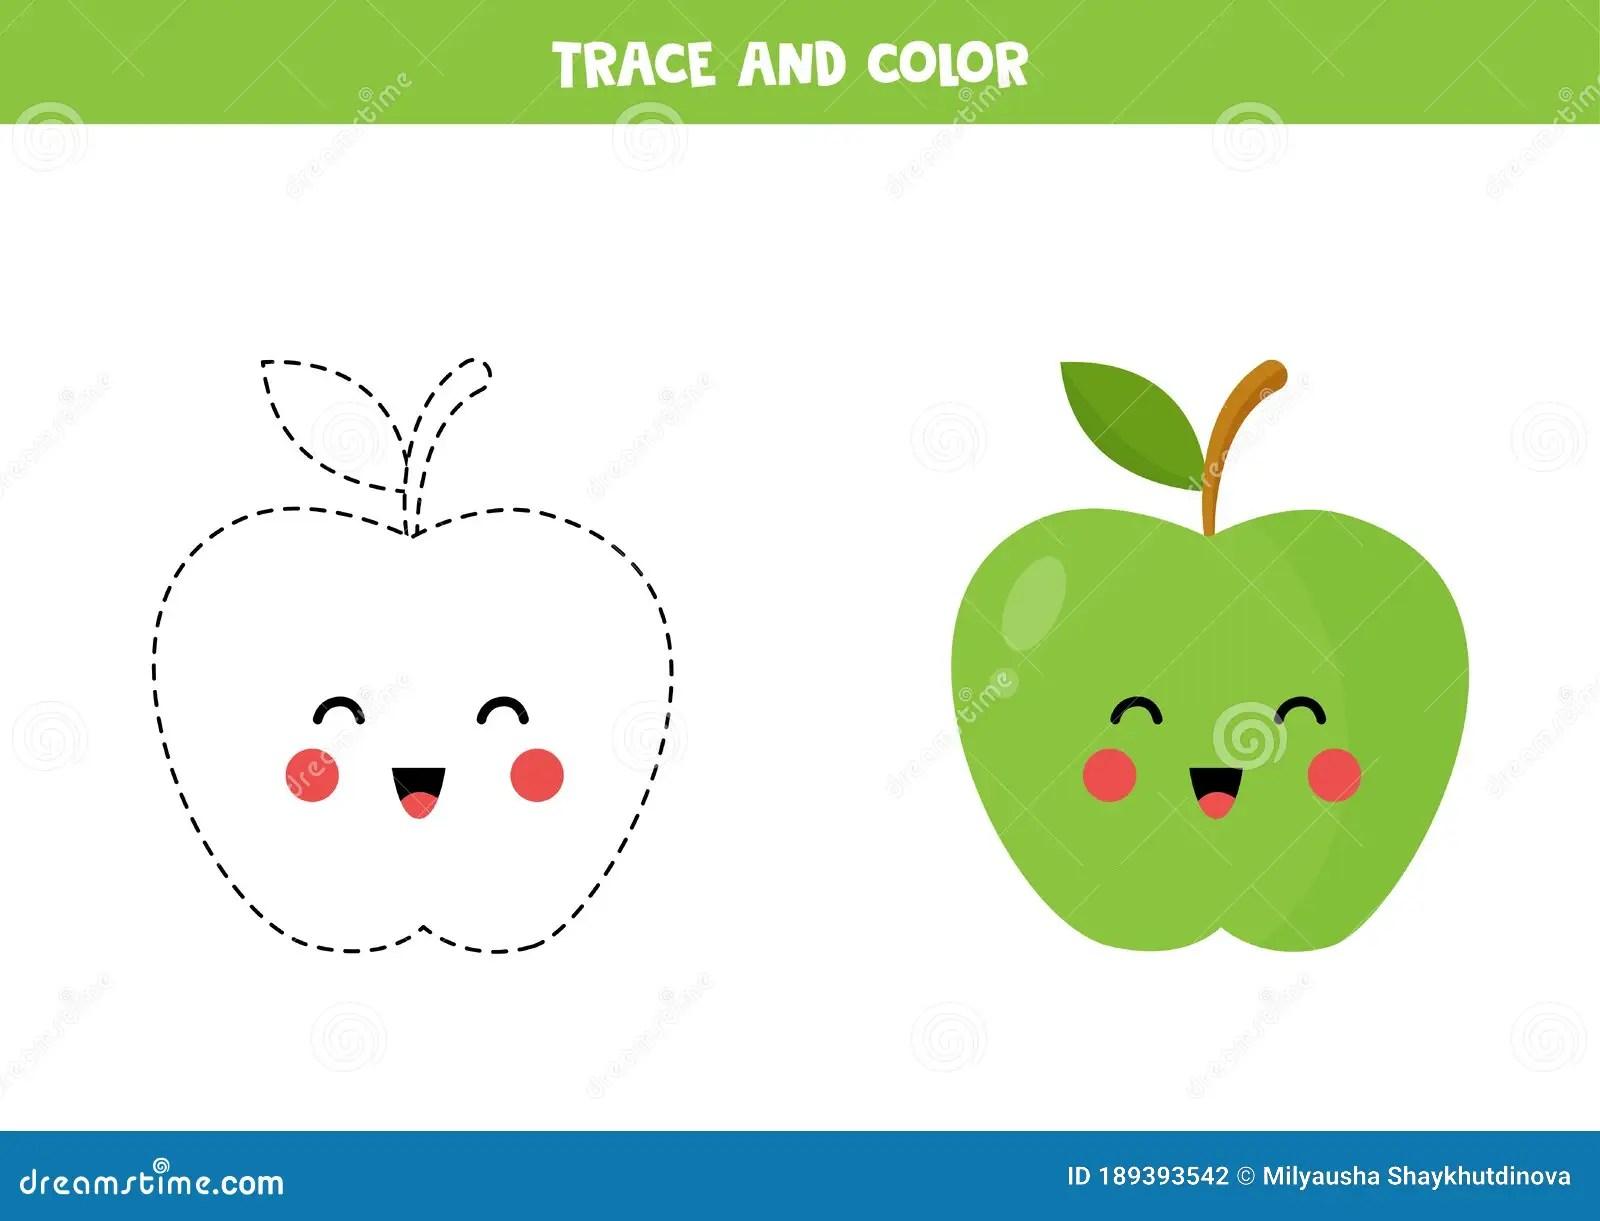 Trace And Color Cute Kawaii Green Apple Educational